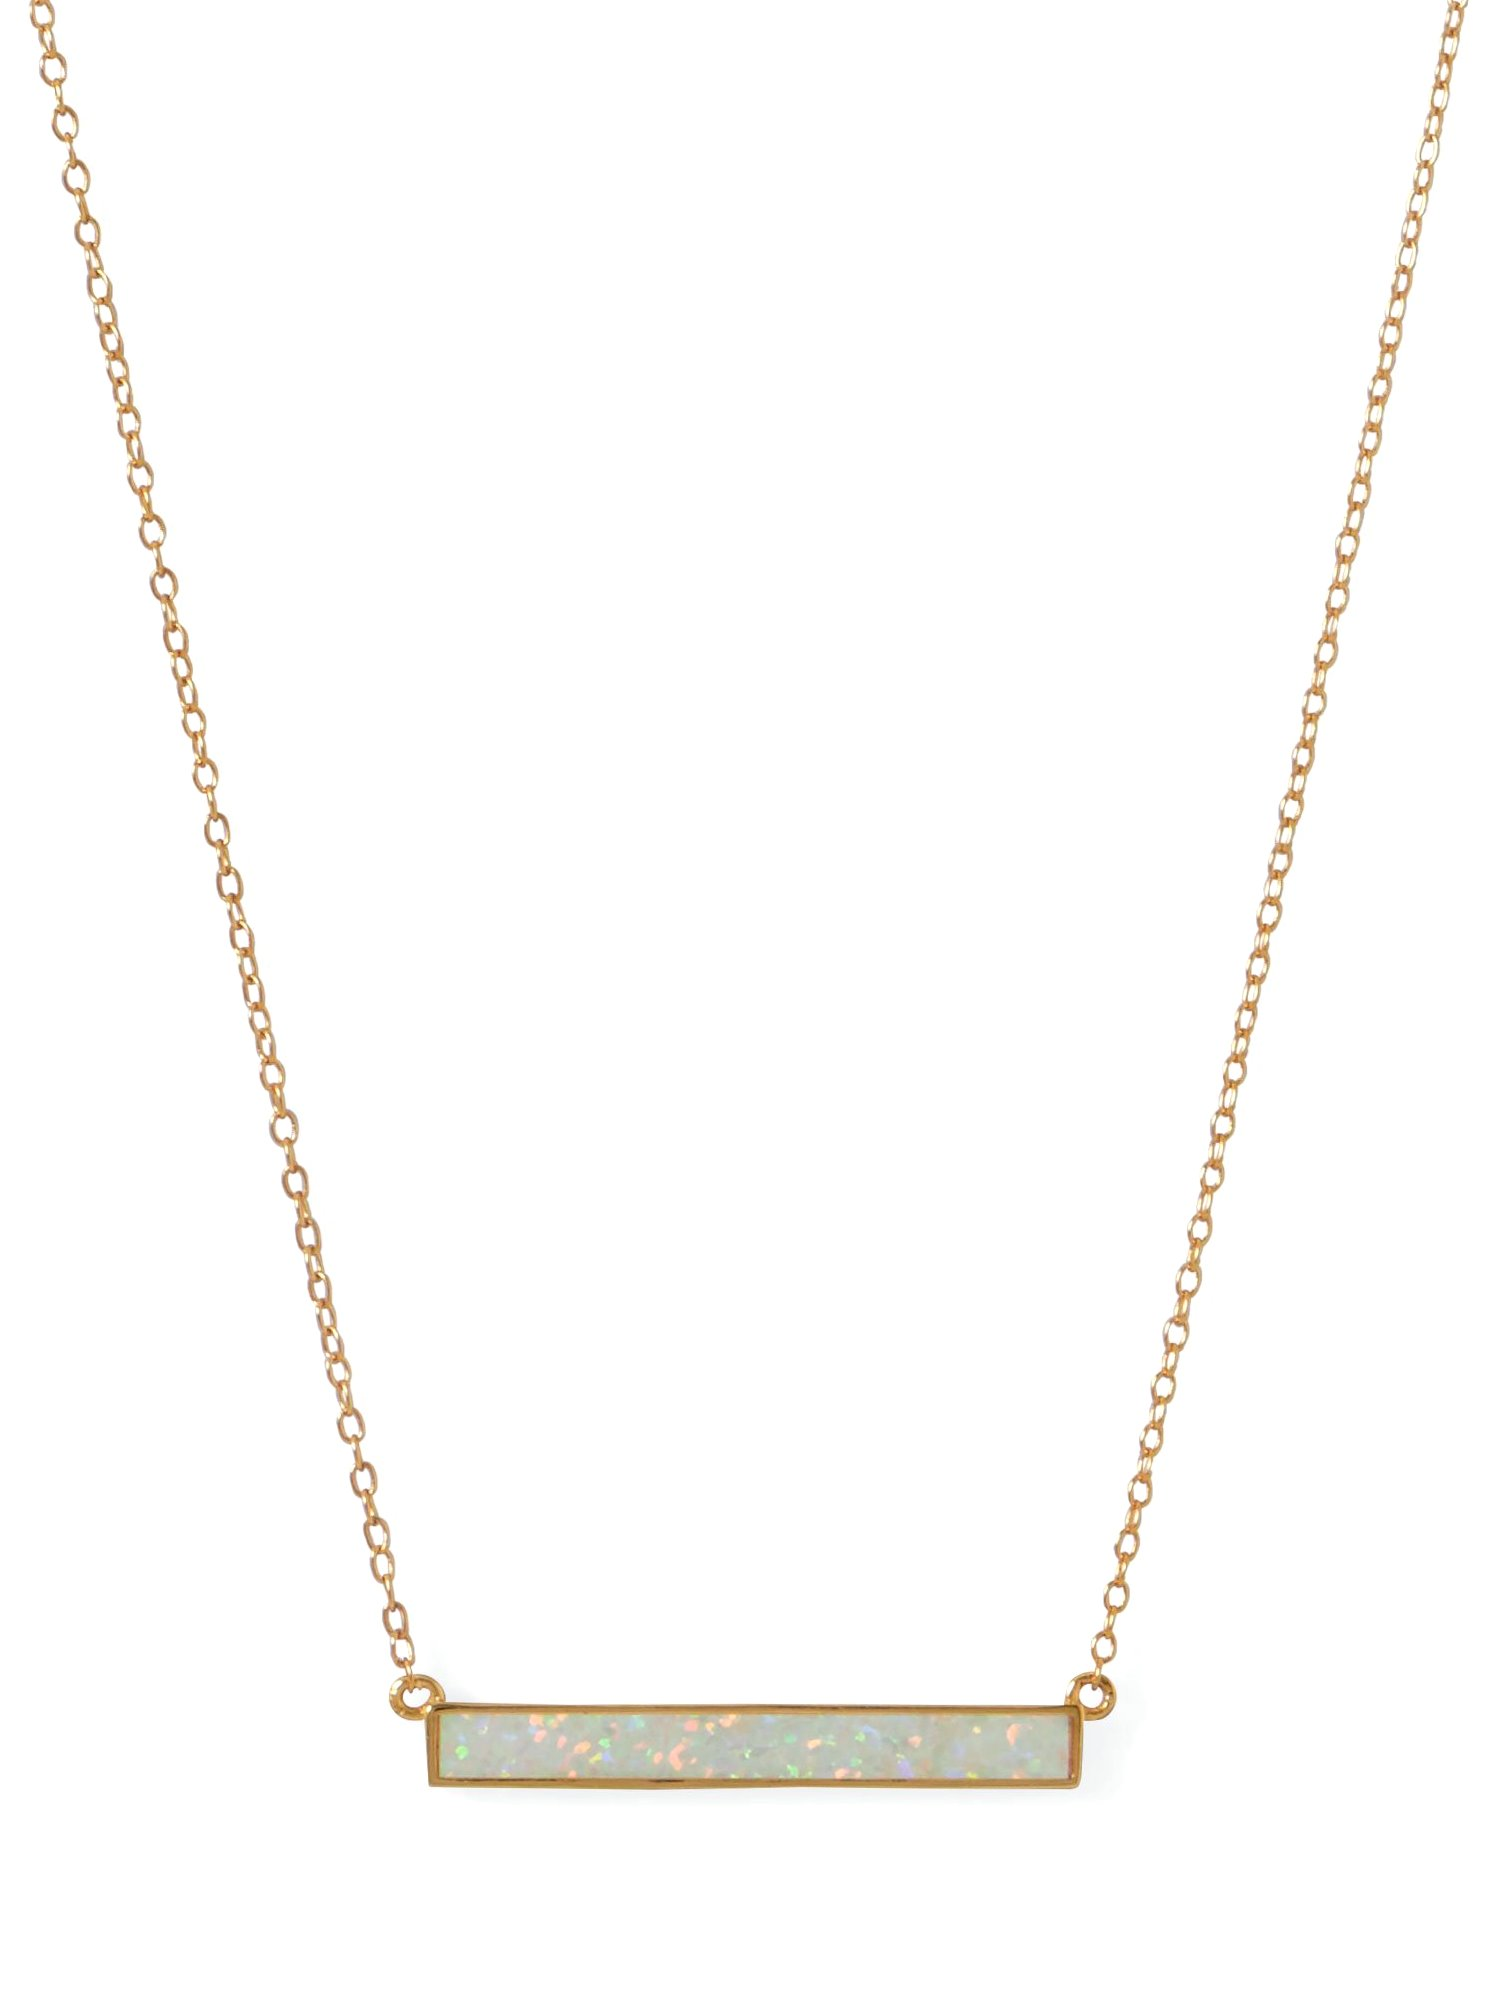 Opal necklace  opal bar necklace